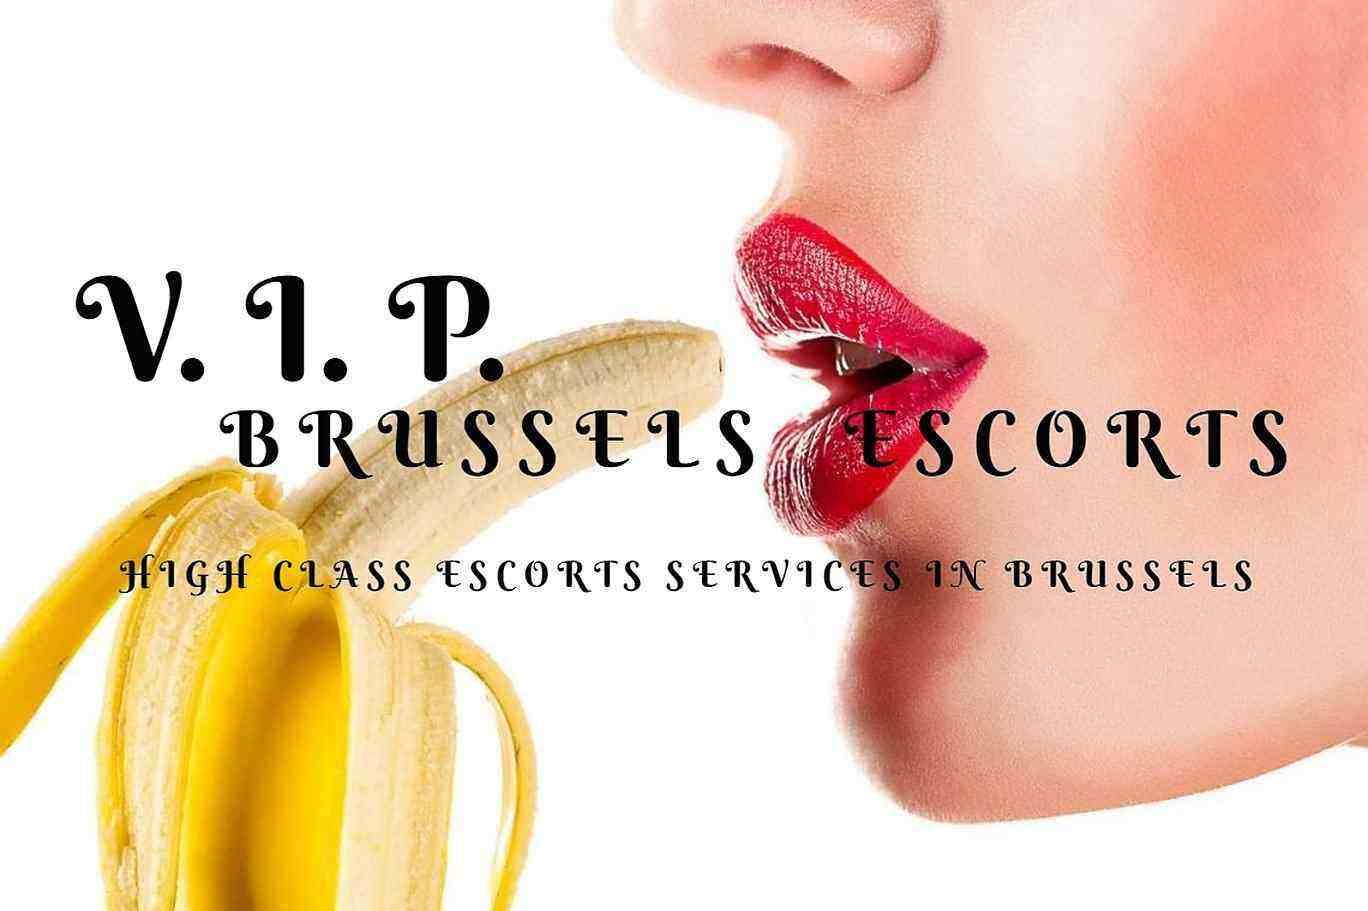 Brussels Escorts